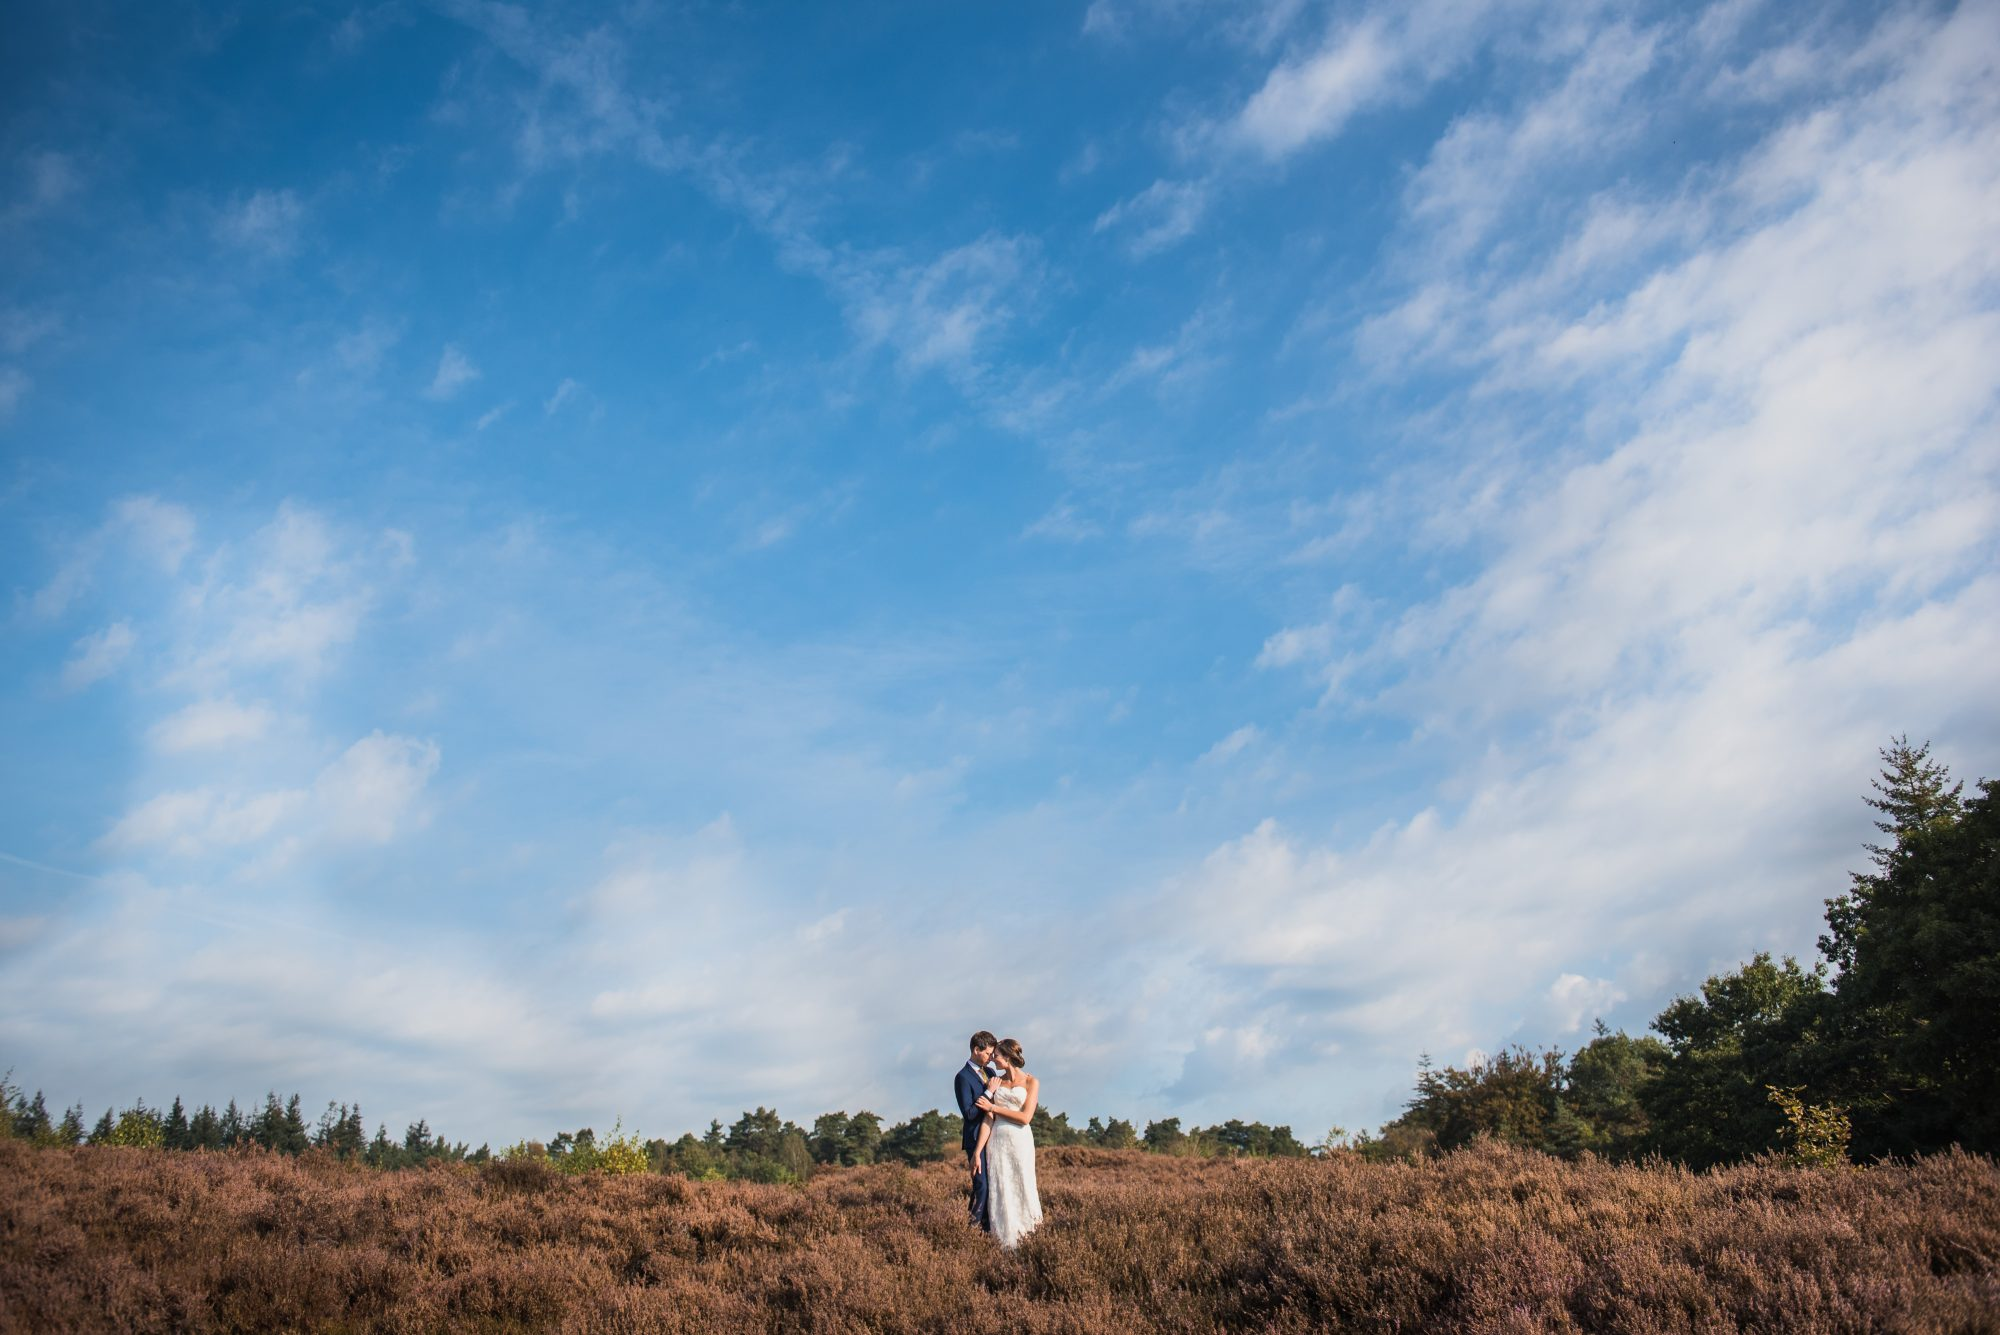 bruiloft-roland-annewil-188